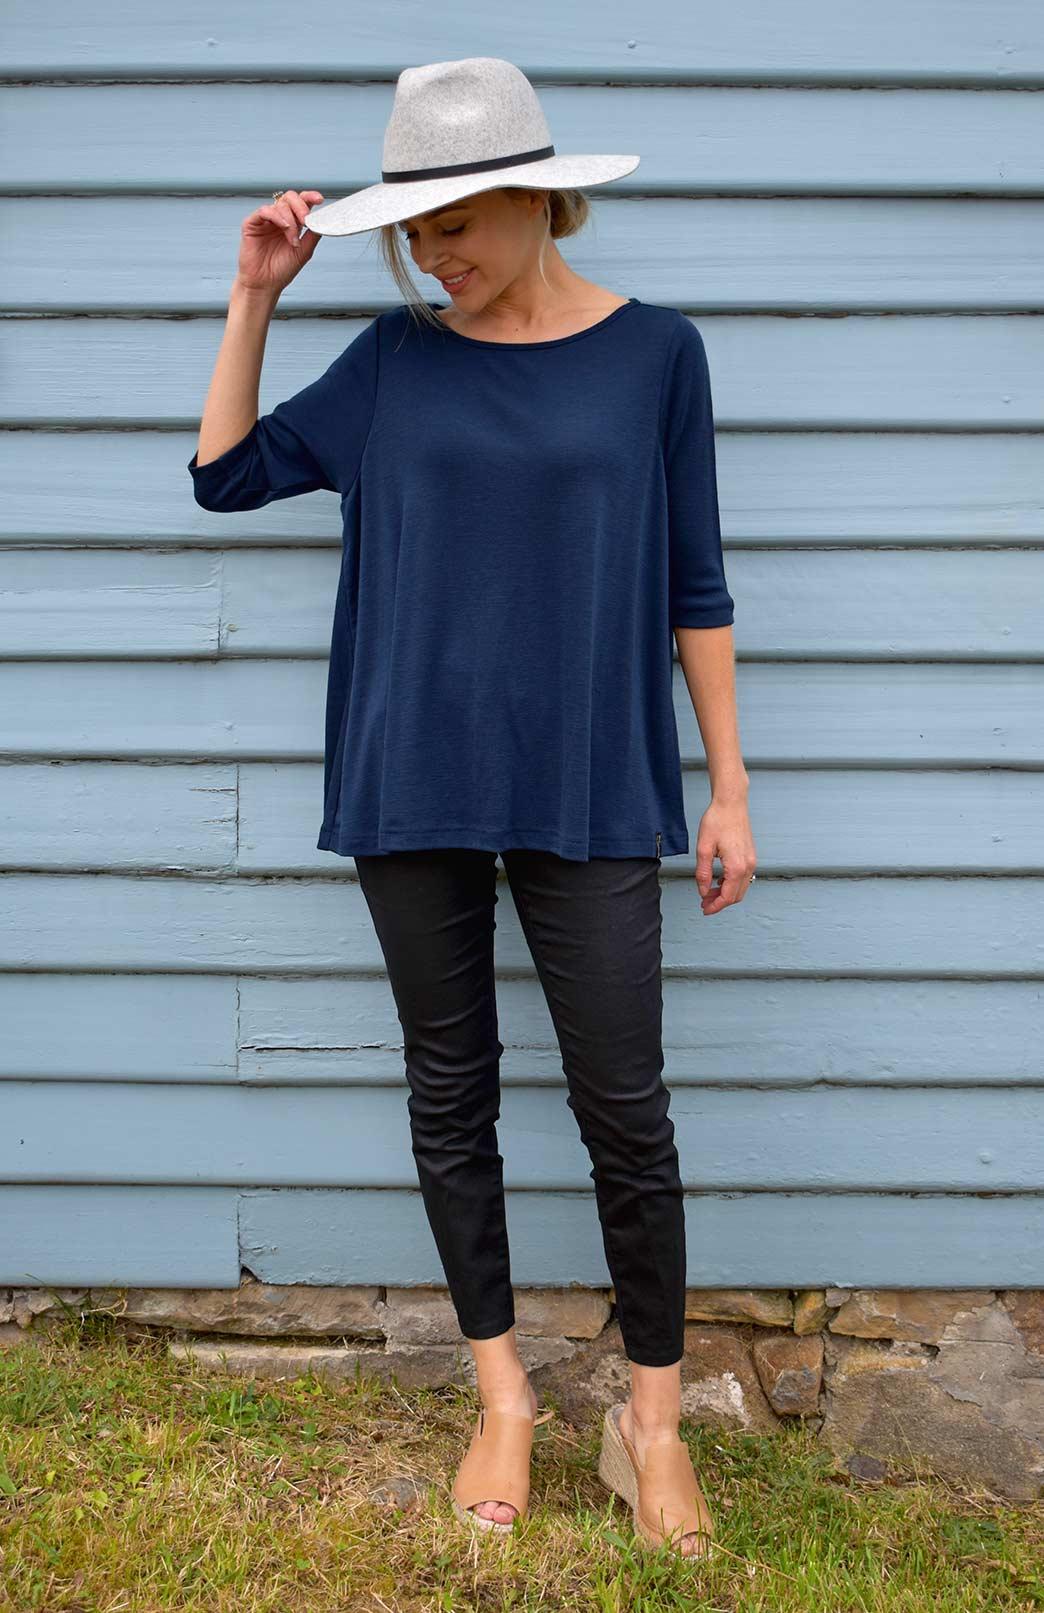 3/4 Flutter Top - Women's Ink Blue Merino Wool 3/4 Sleeve Spring Top - Smitten Merino Tasmania Australia